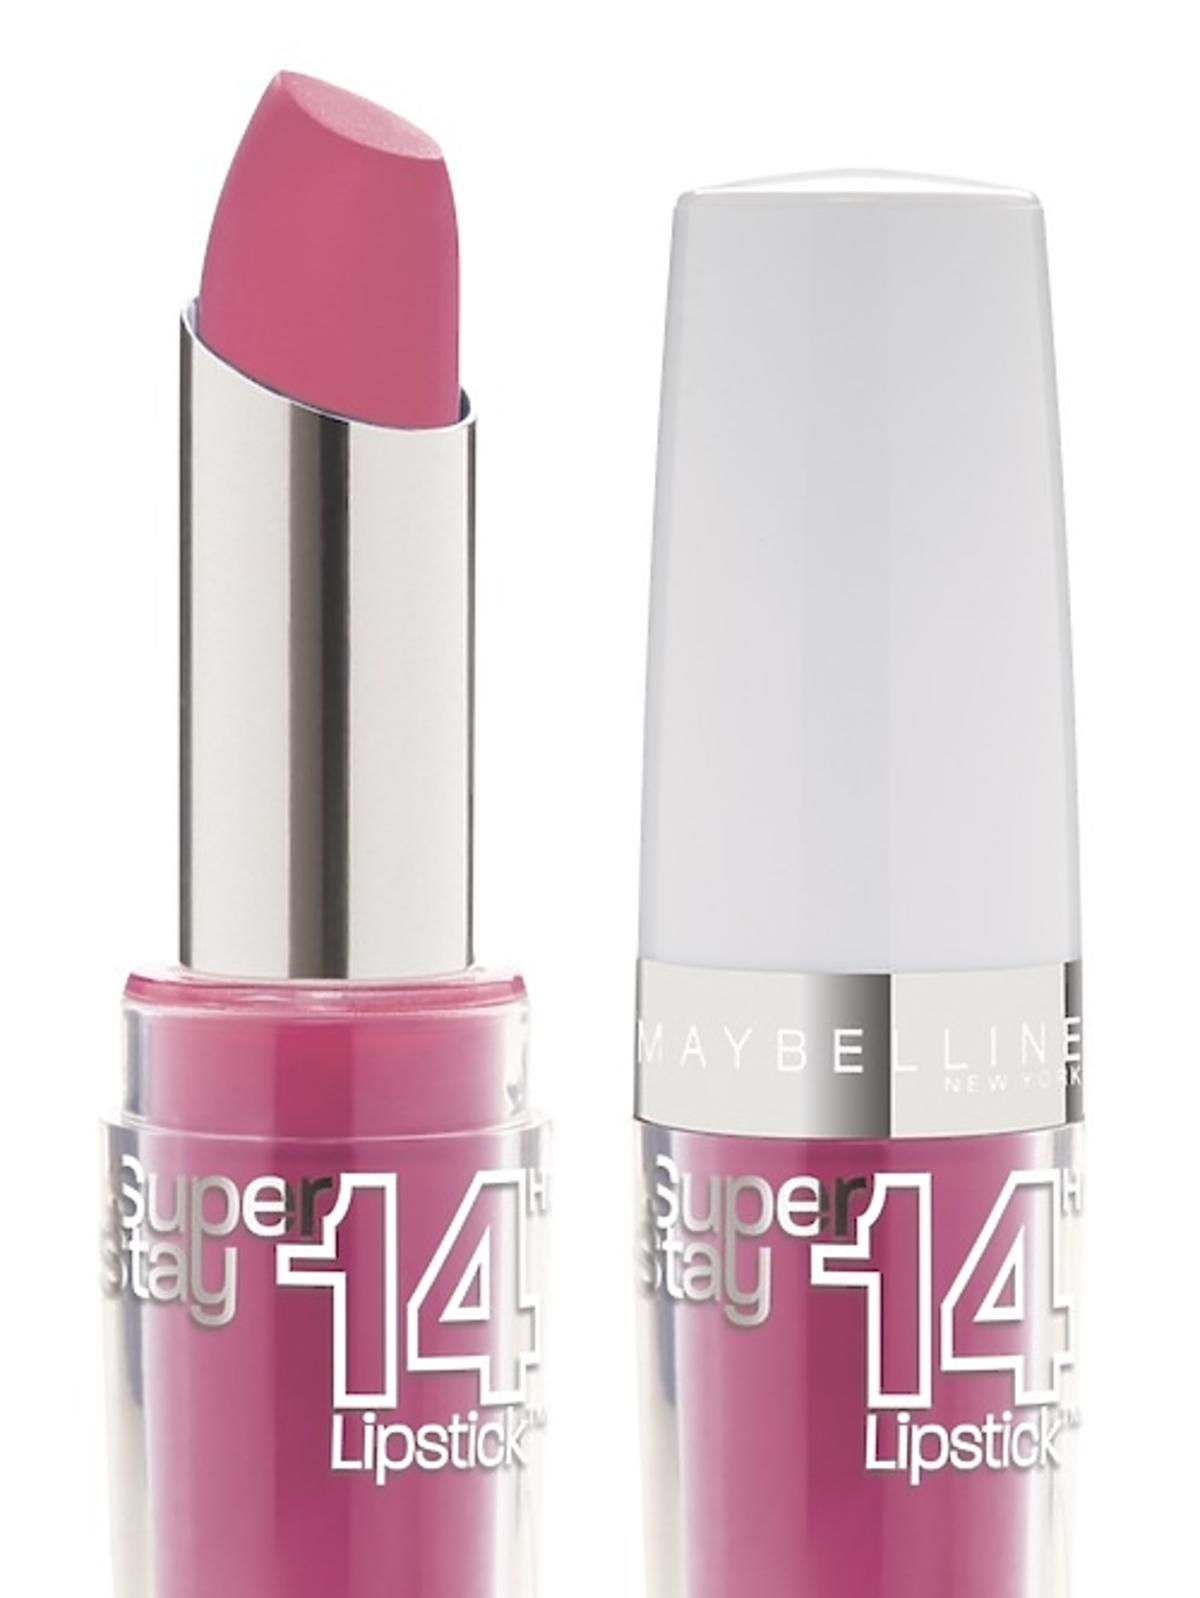 Szminka SuperStay 14H Lipstick, Maybelline, 31 zł